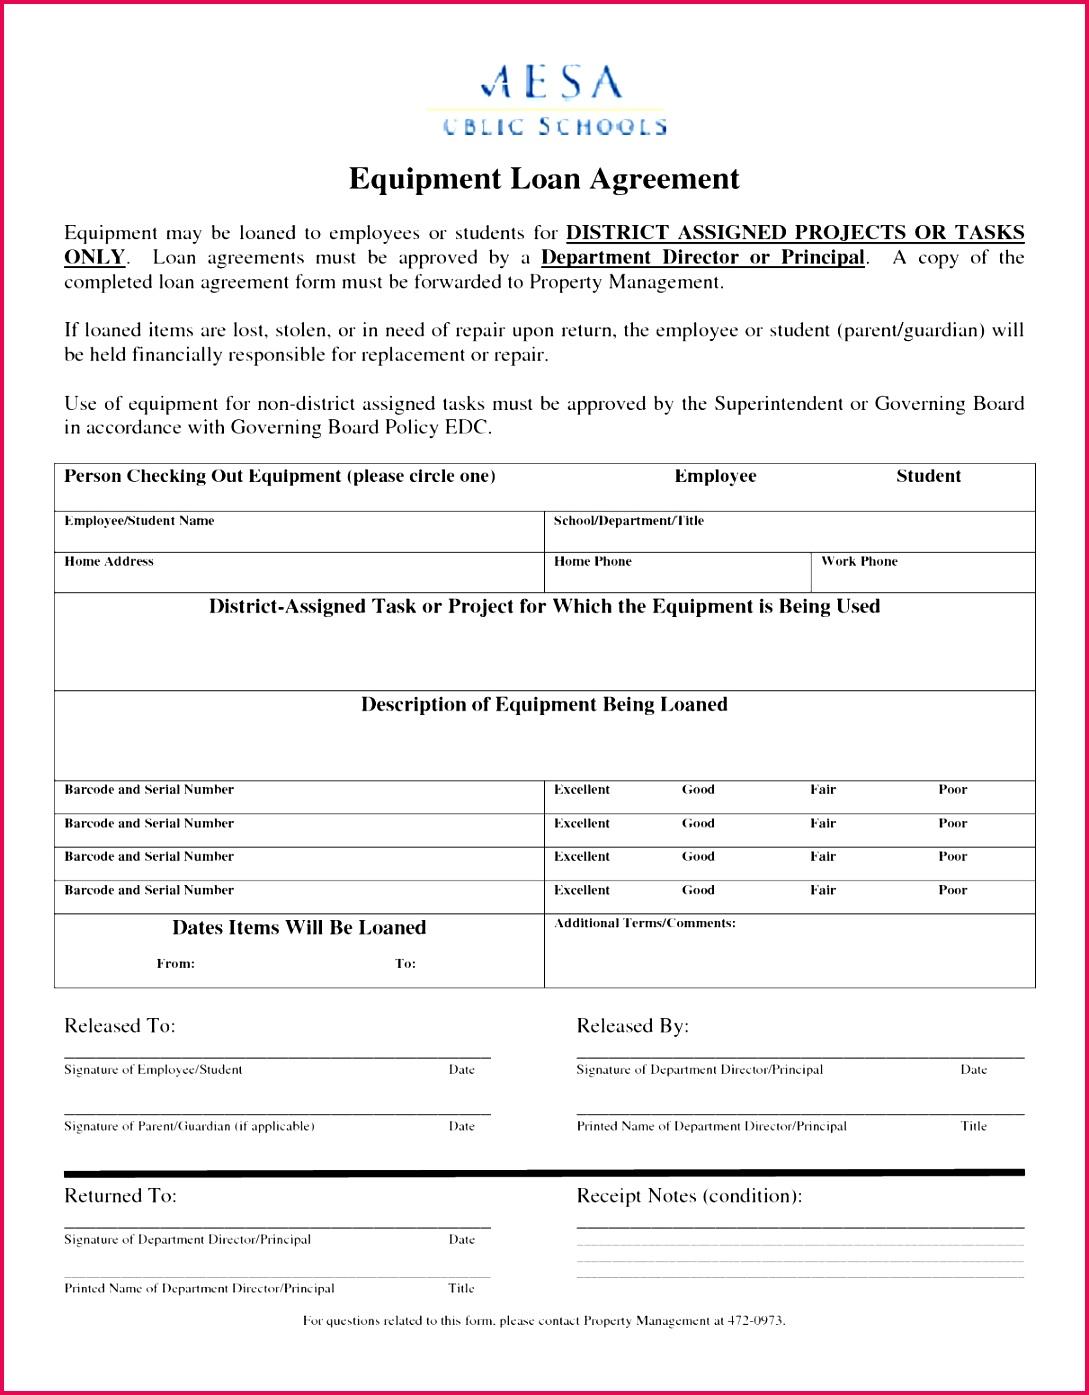 Employee loan form template besttemplates equipment samples application request demo